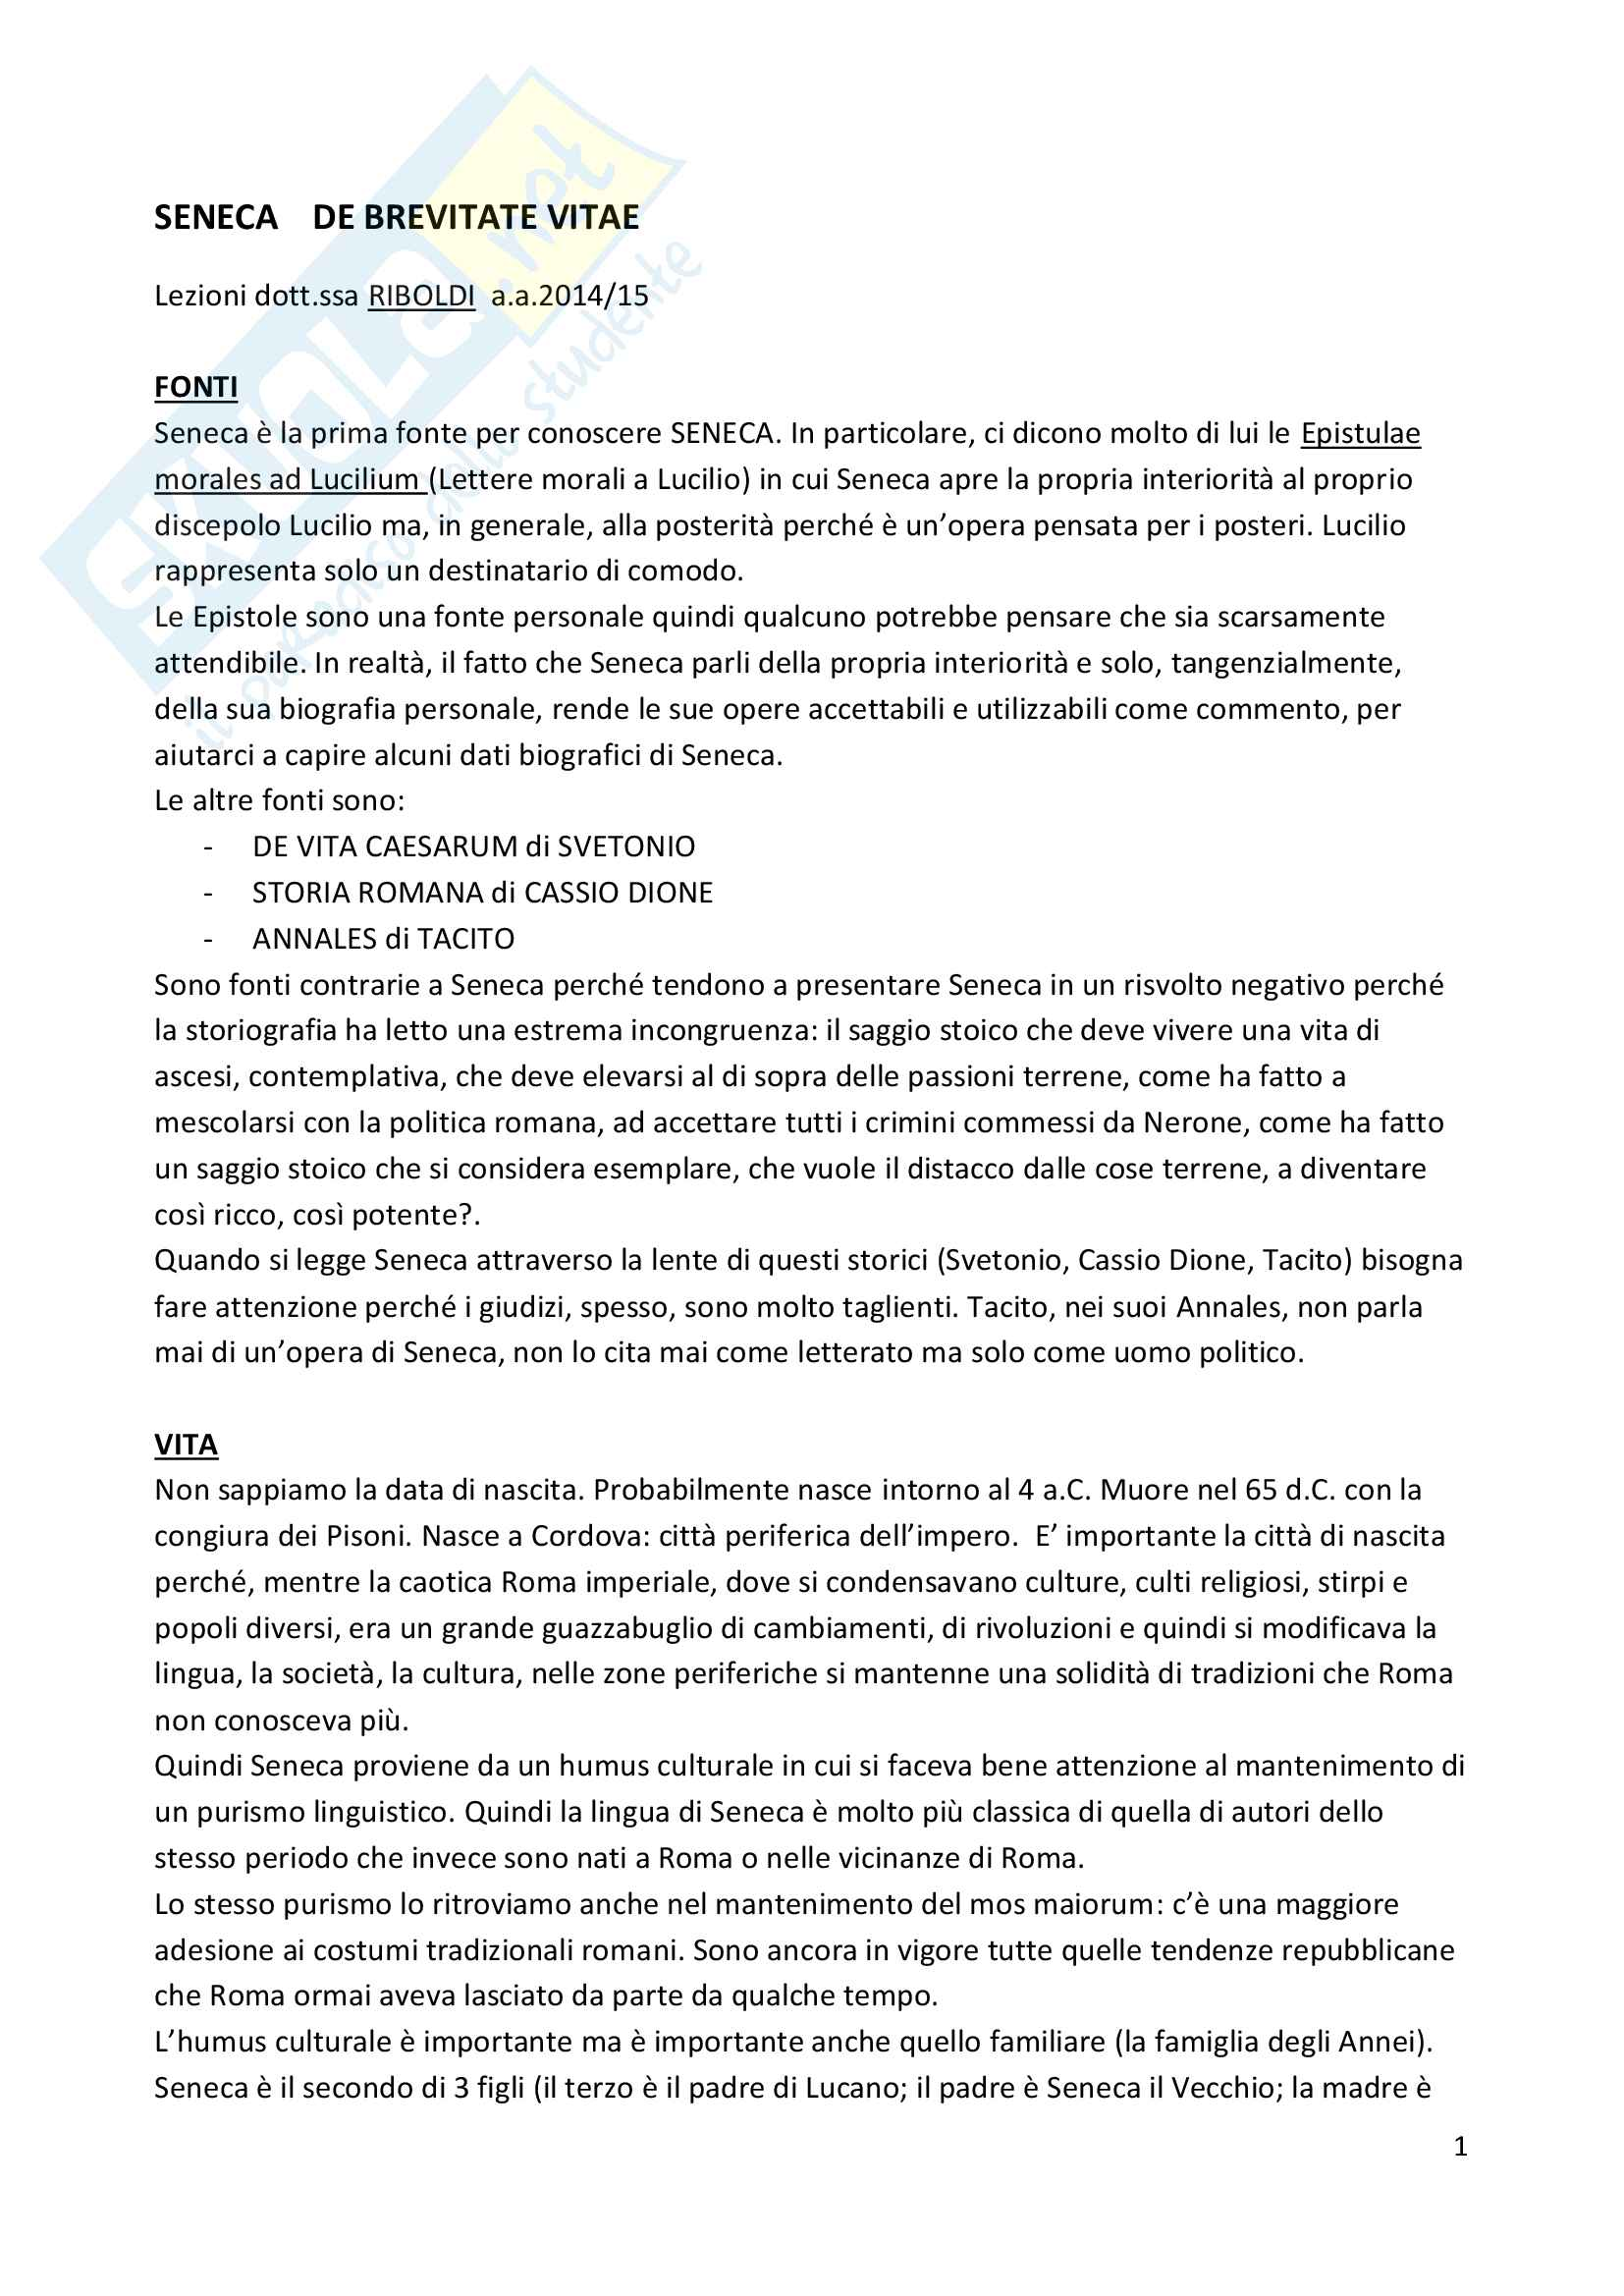 appunto C. Riboldi Lingua latina